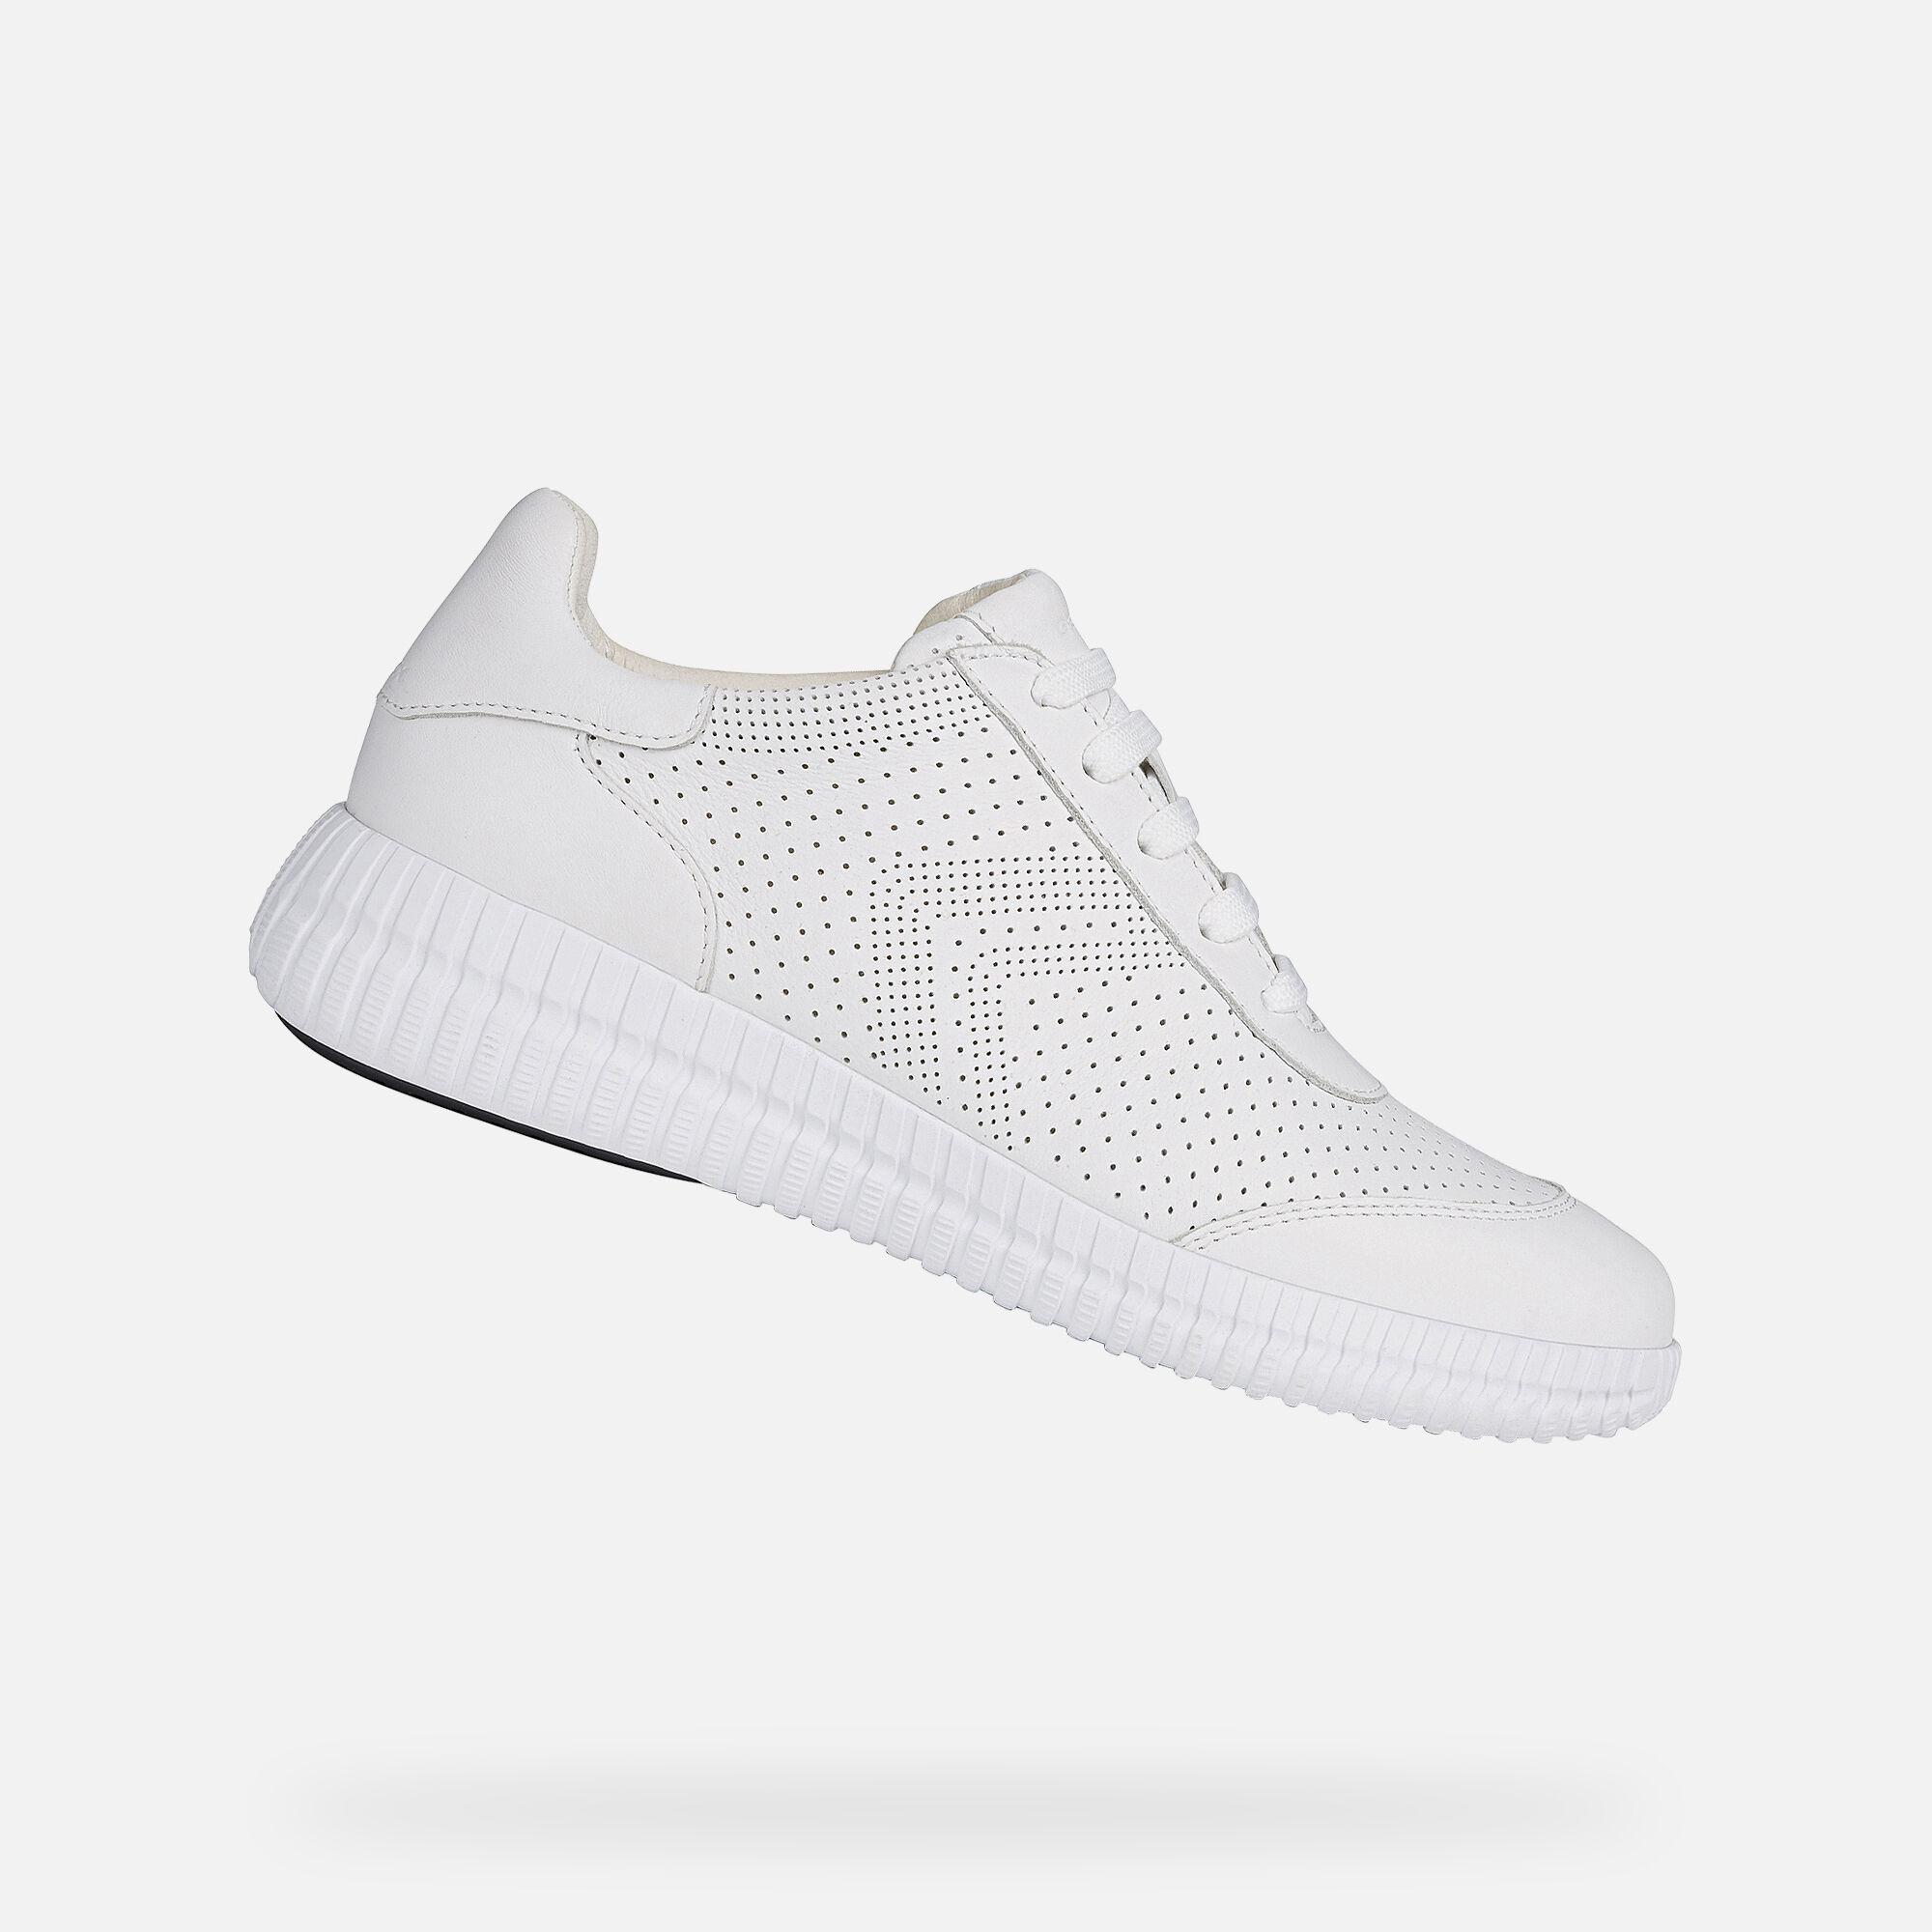 Geox NOOVAE Woman: White Sneakers